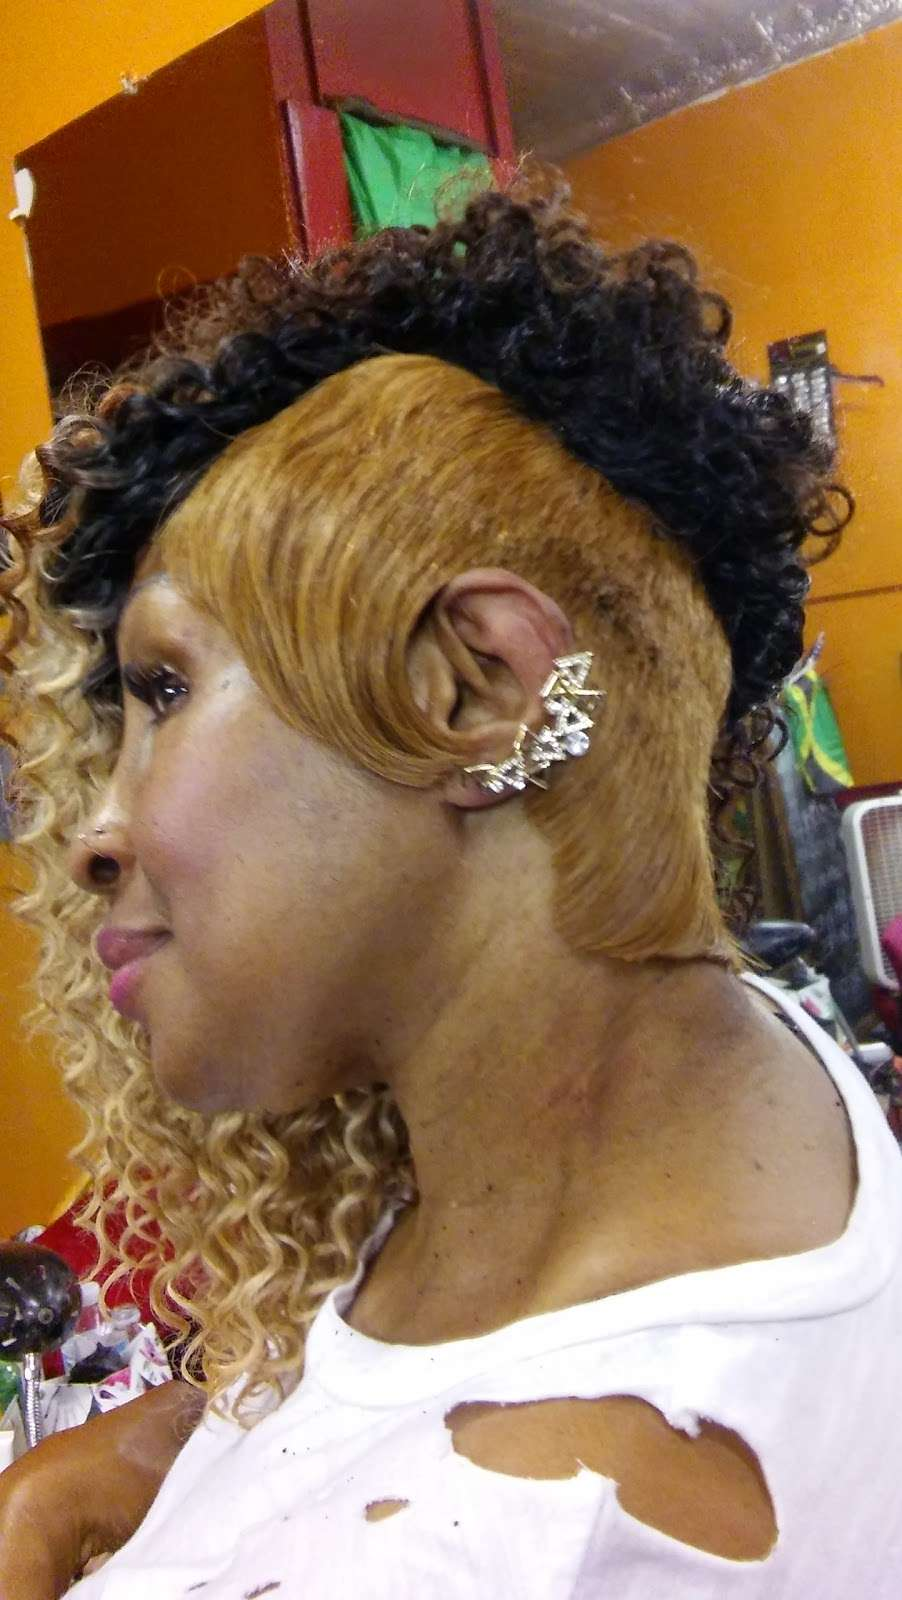 Posh Unisex Beauty Salon - hair care    Photo 6 of 10   Address: Springdale Ave, East Orange, NJ 07017, USA   Phone: (973) 519-1990